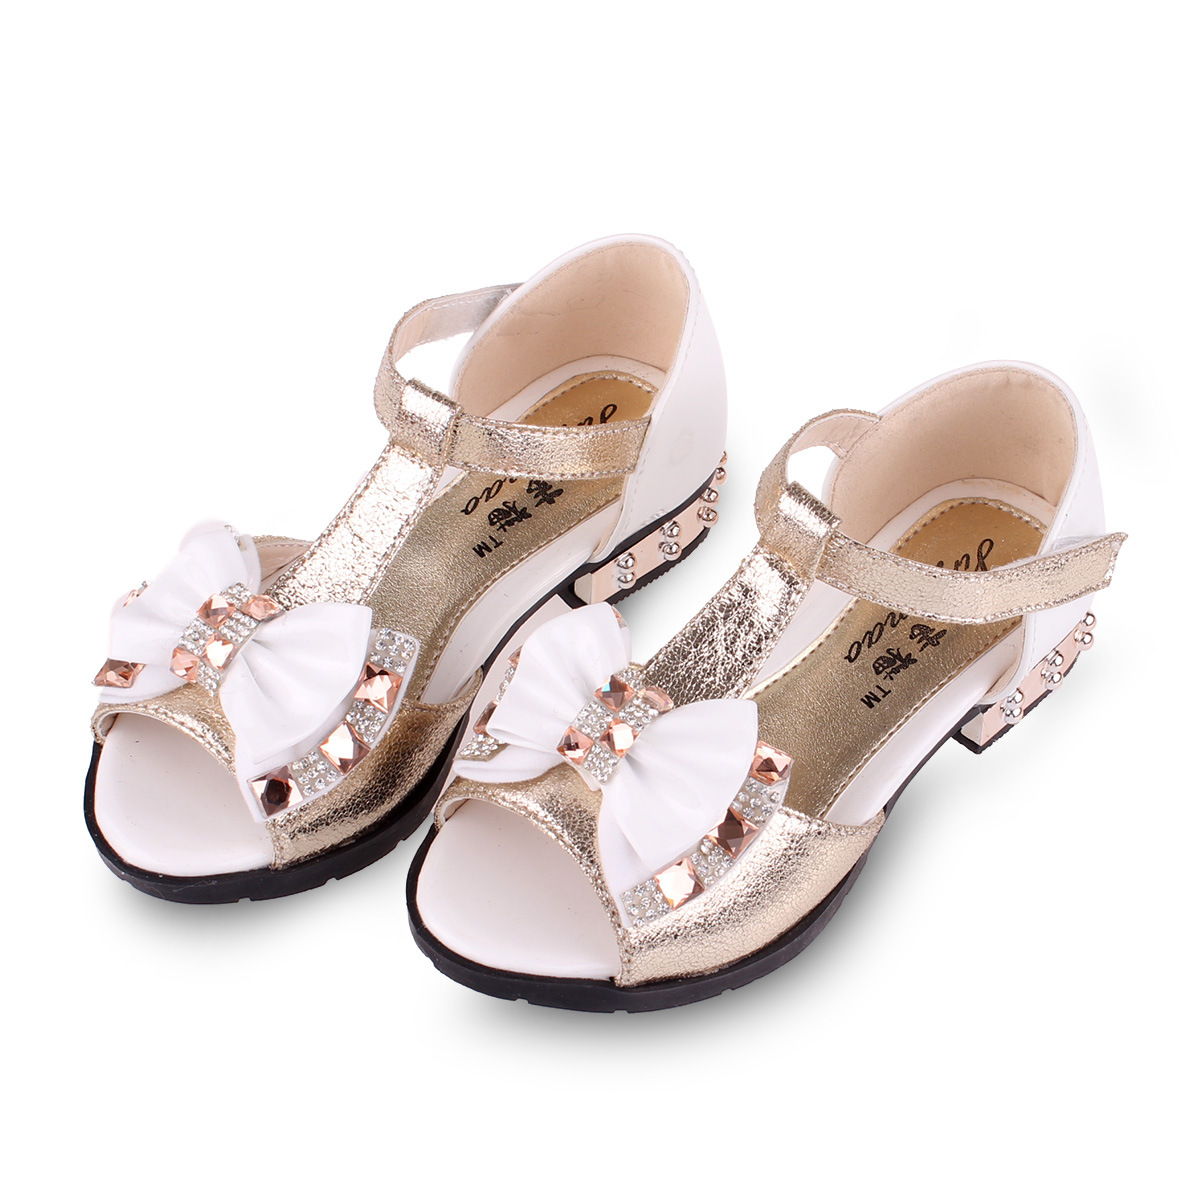 Girls sandals - Online Shop Shoes For Girls Sandals Children Shoes Girls Kids Shoes Princess Shoes Girls Party Shoes Beach Shoes Kids Flat Sandals Girl Aliexpress Mobile